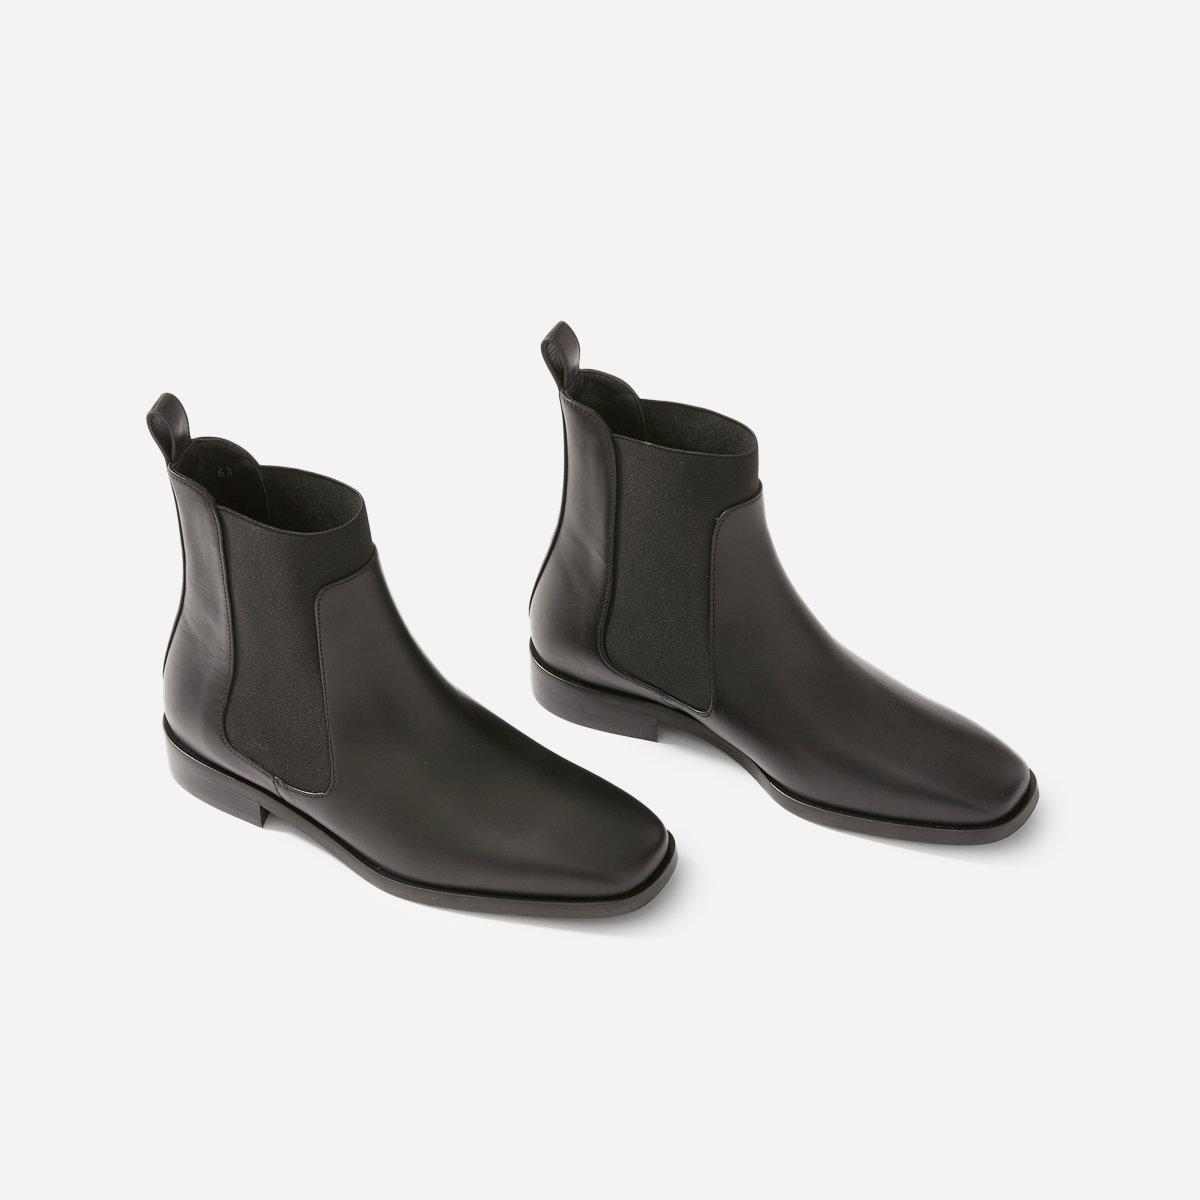 a5b03ffad87 The Square Toe Chelsea Boot